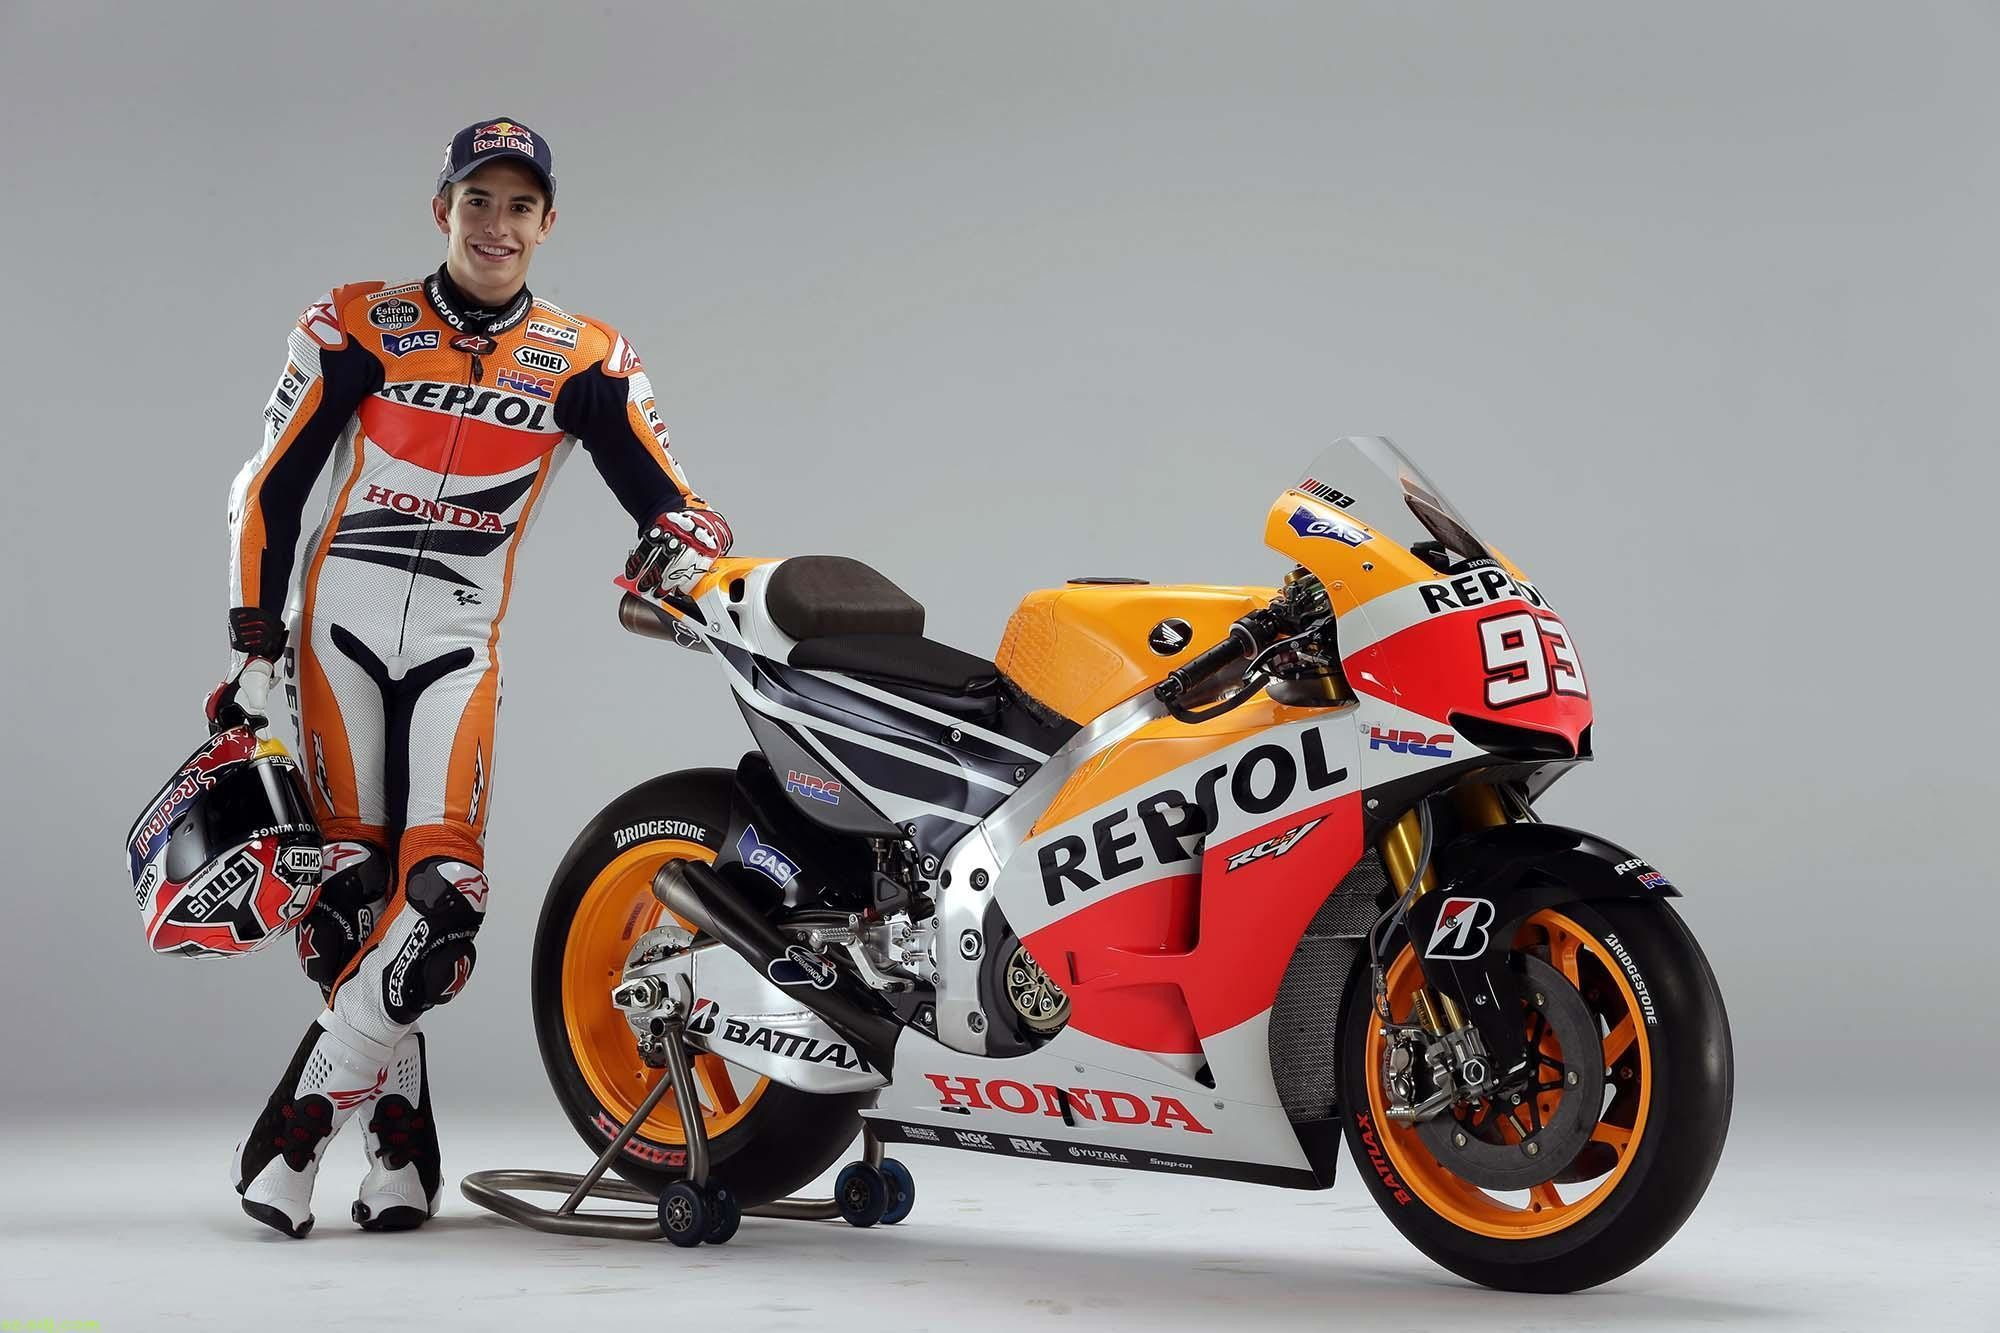 Res: 2000x1333, Custom Yamaha R6 - image #53